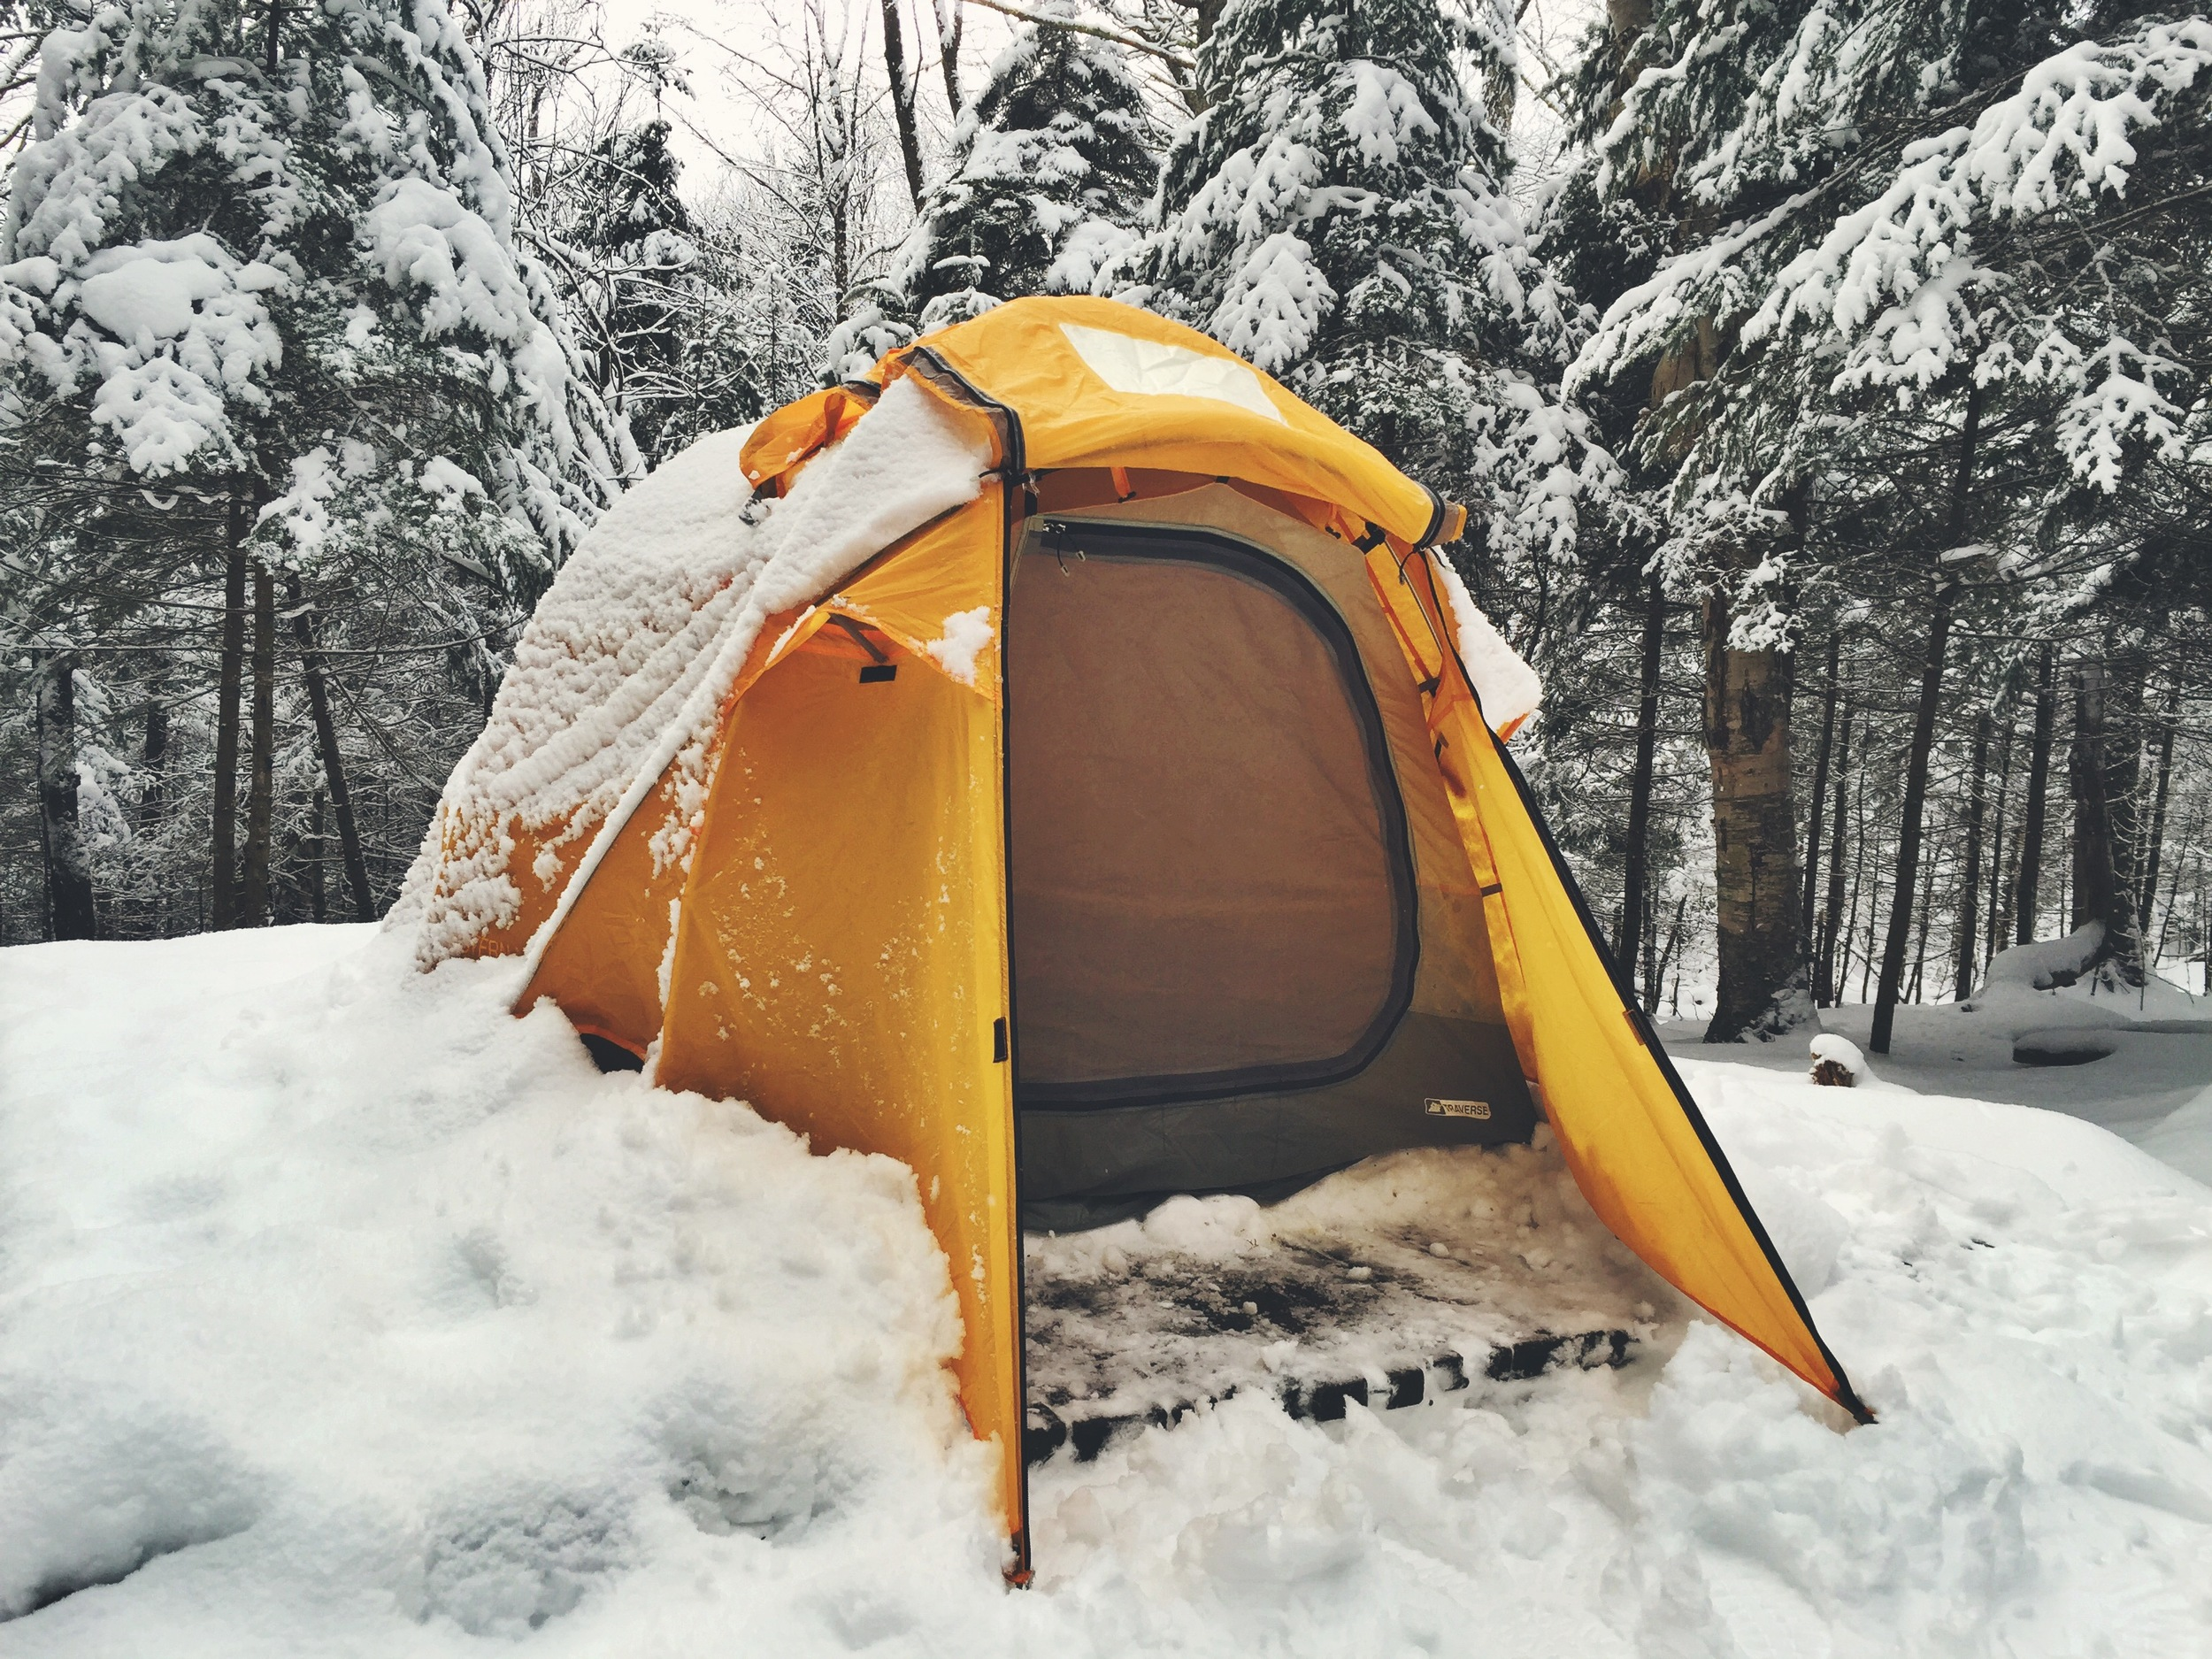 Our beautiful four season EMS Traverse tent